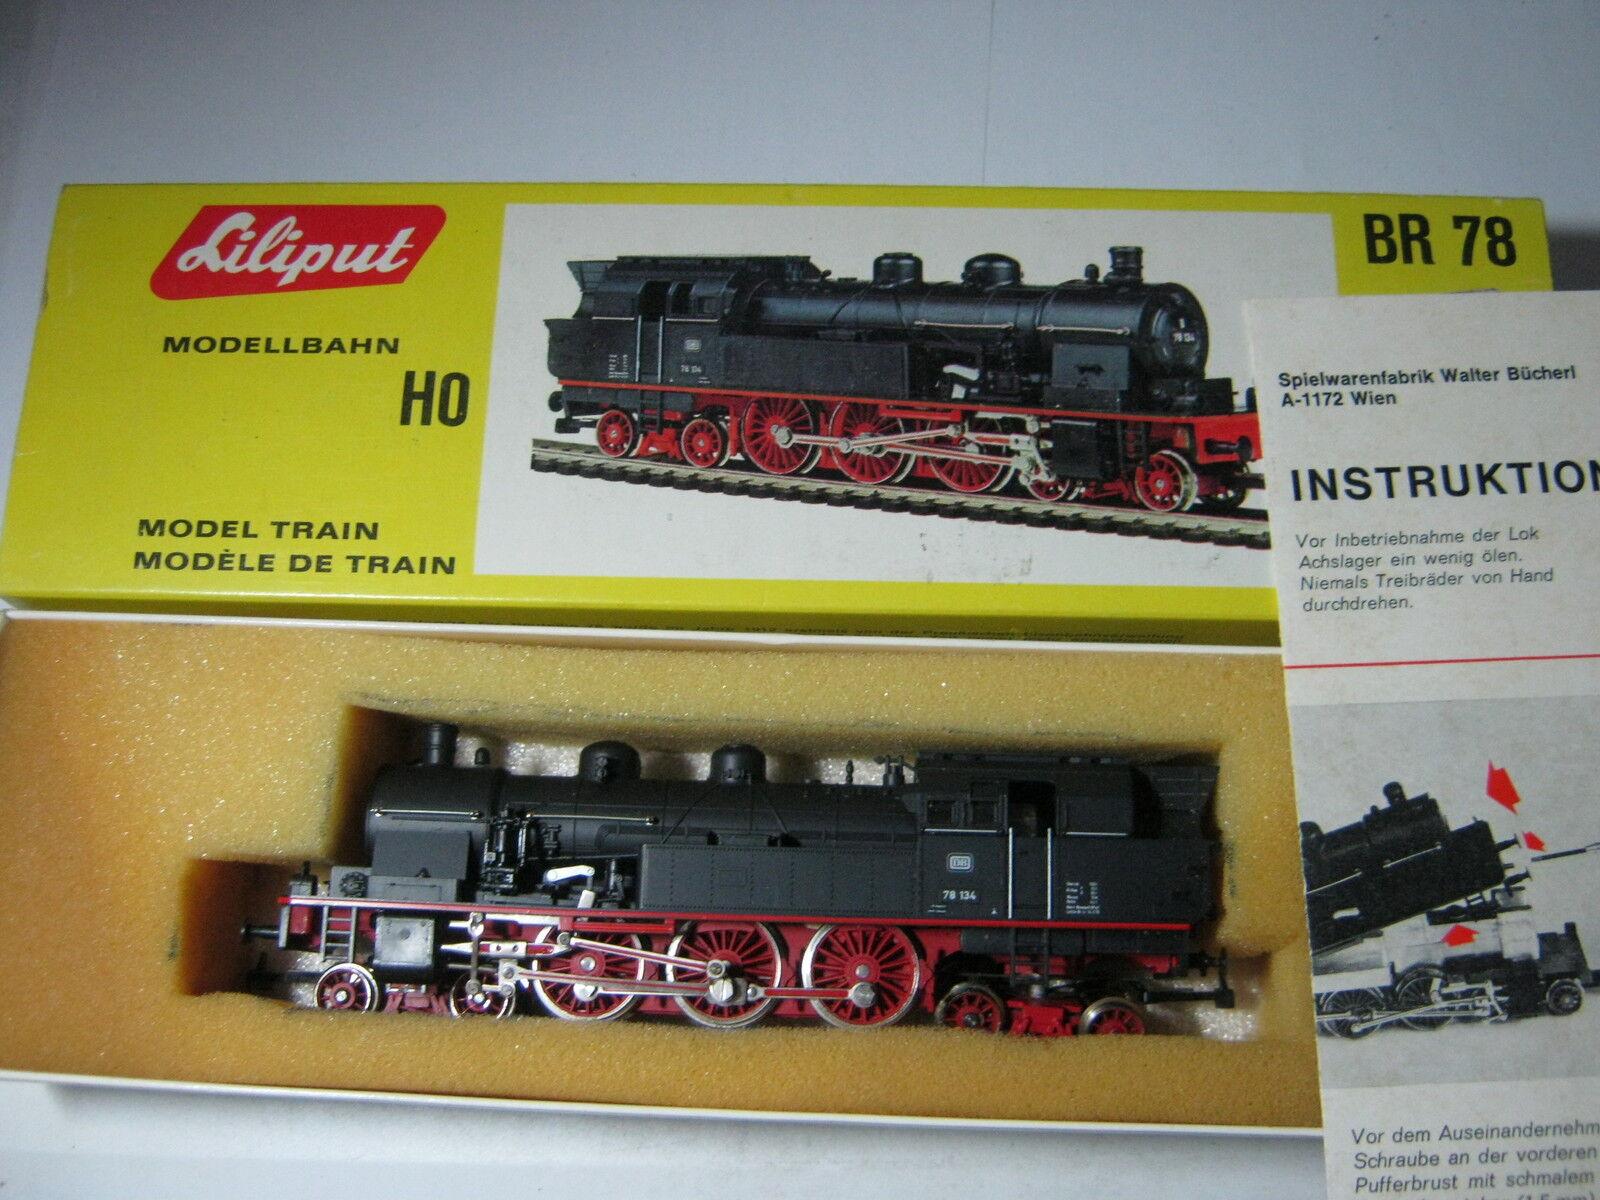 Liliput HO 078 vapore locomotiva btrnr 78 134 DB  rg/bb/72s1